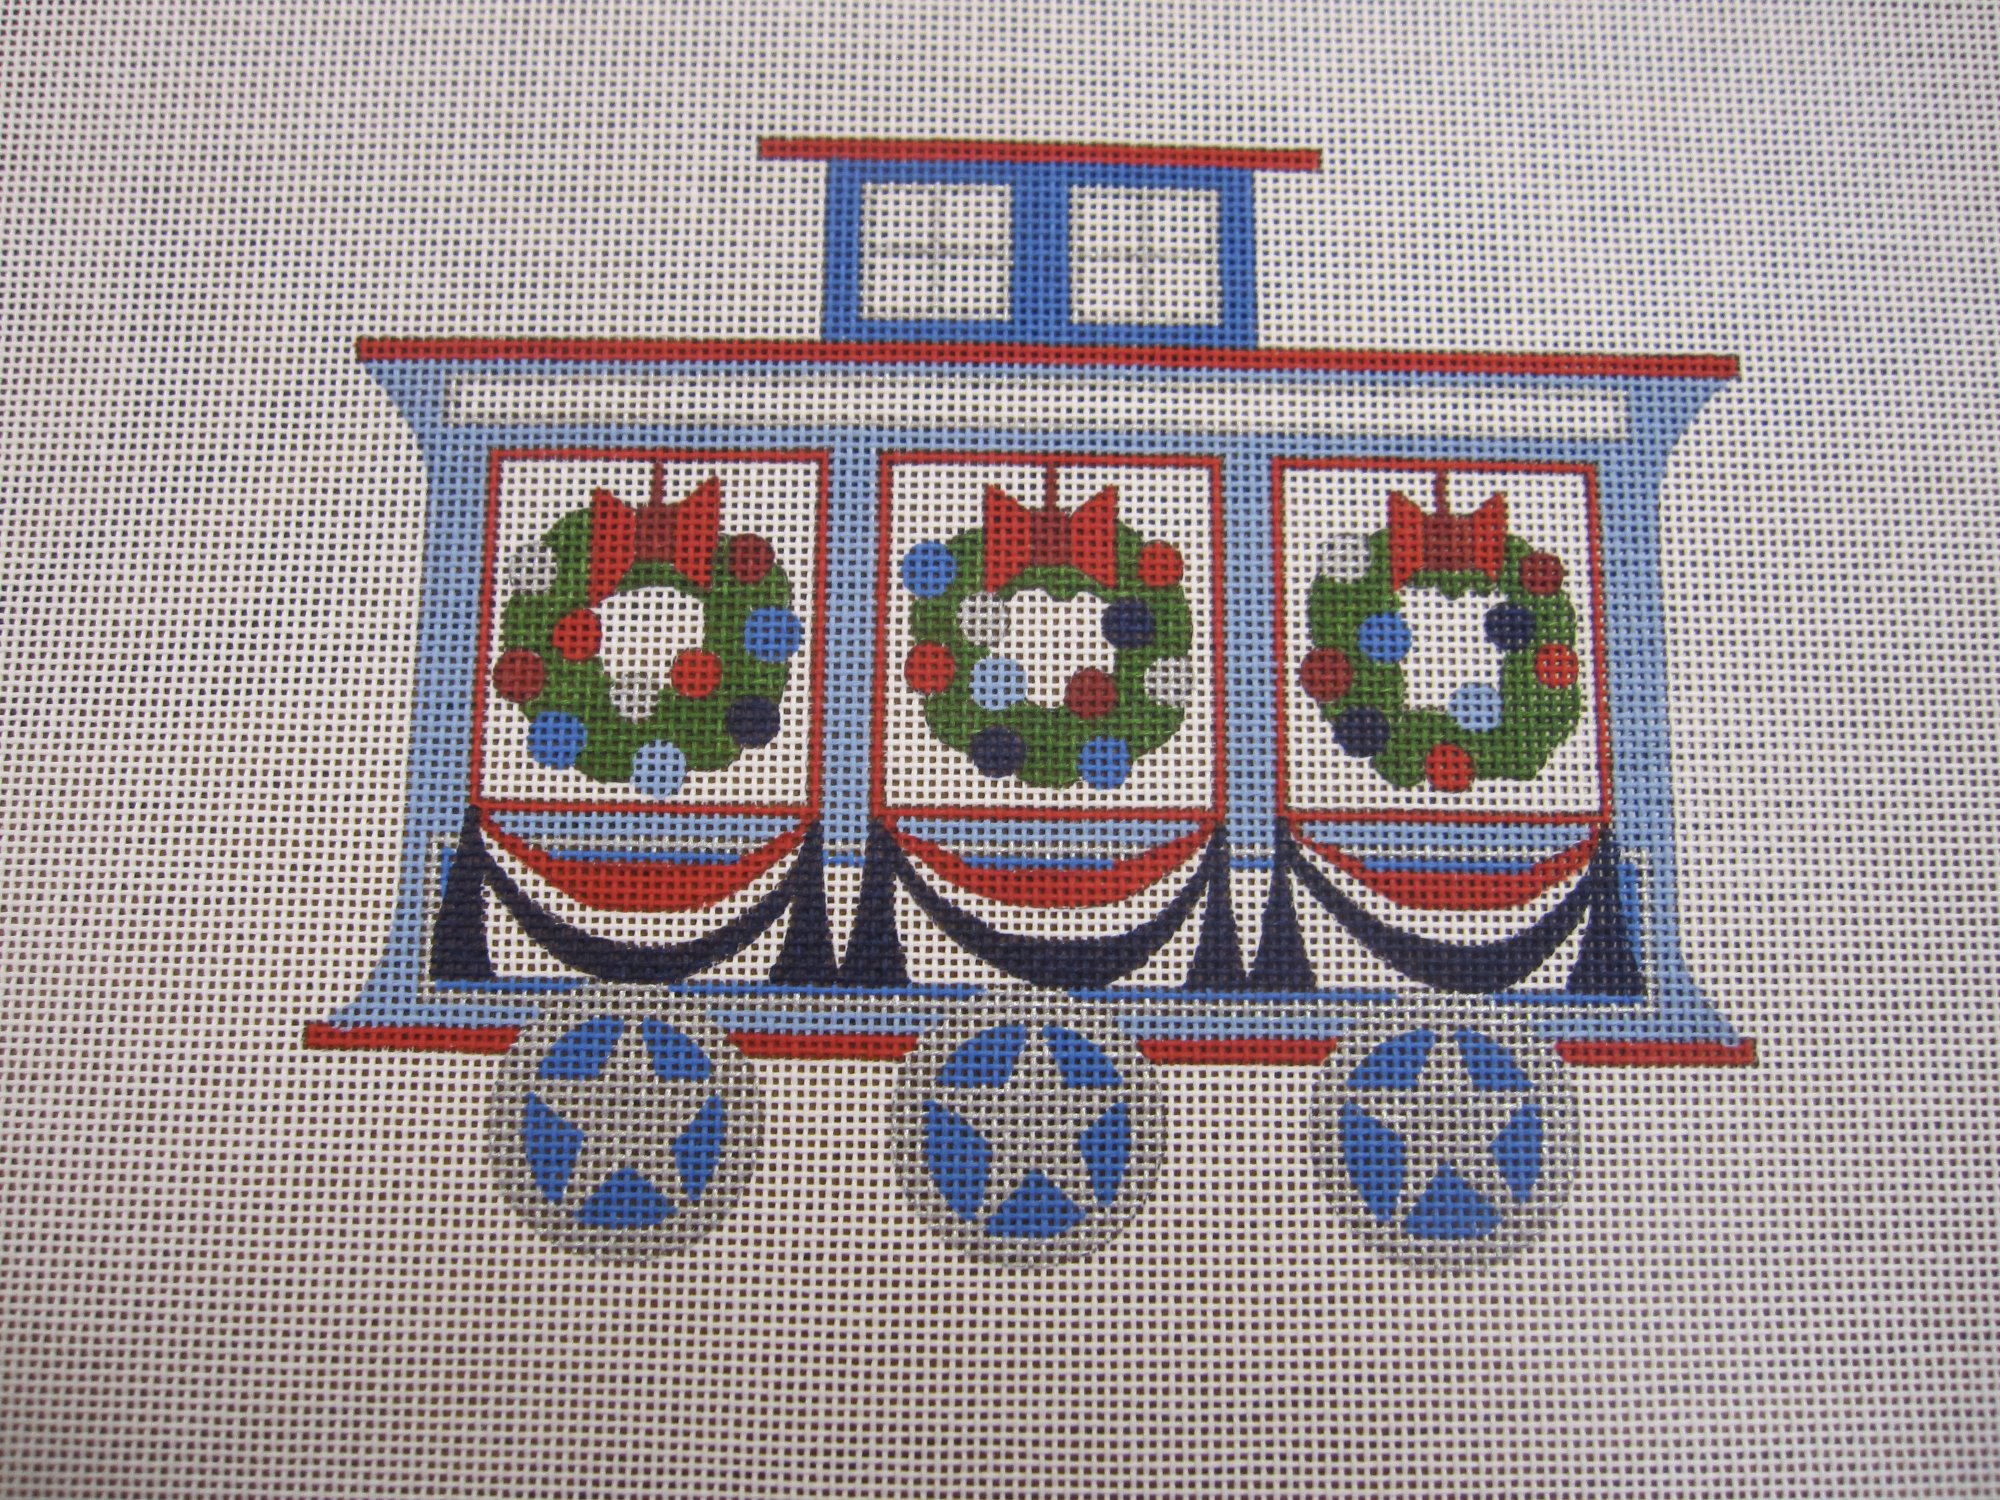 American Train - Caboose